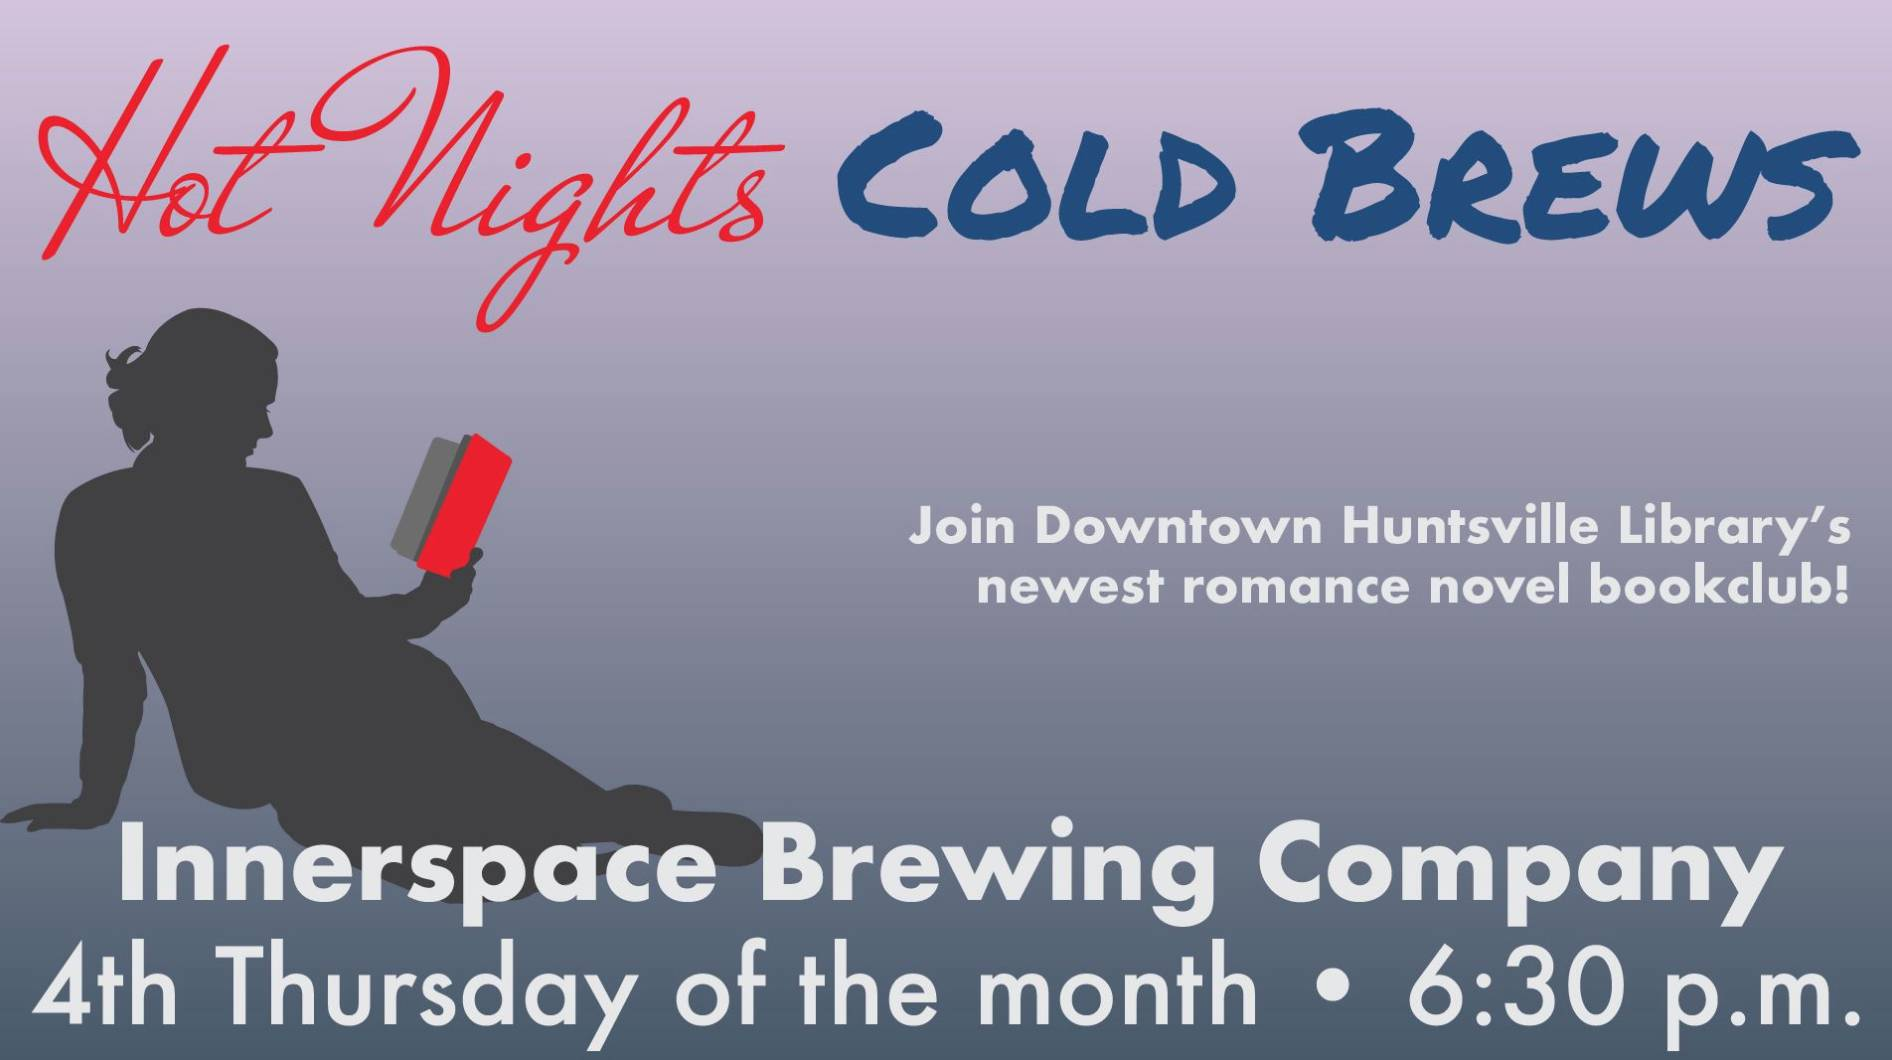 Hot Nights, Cold Brews